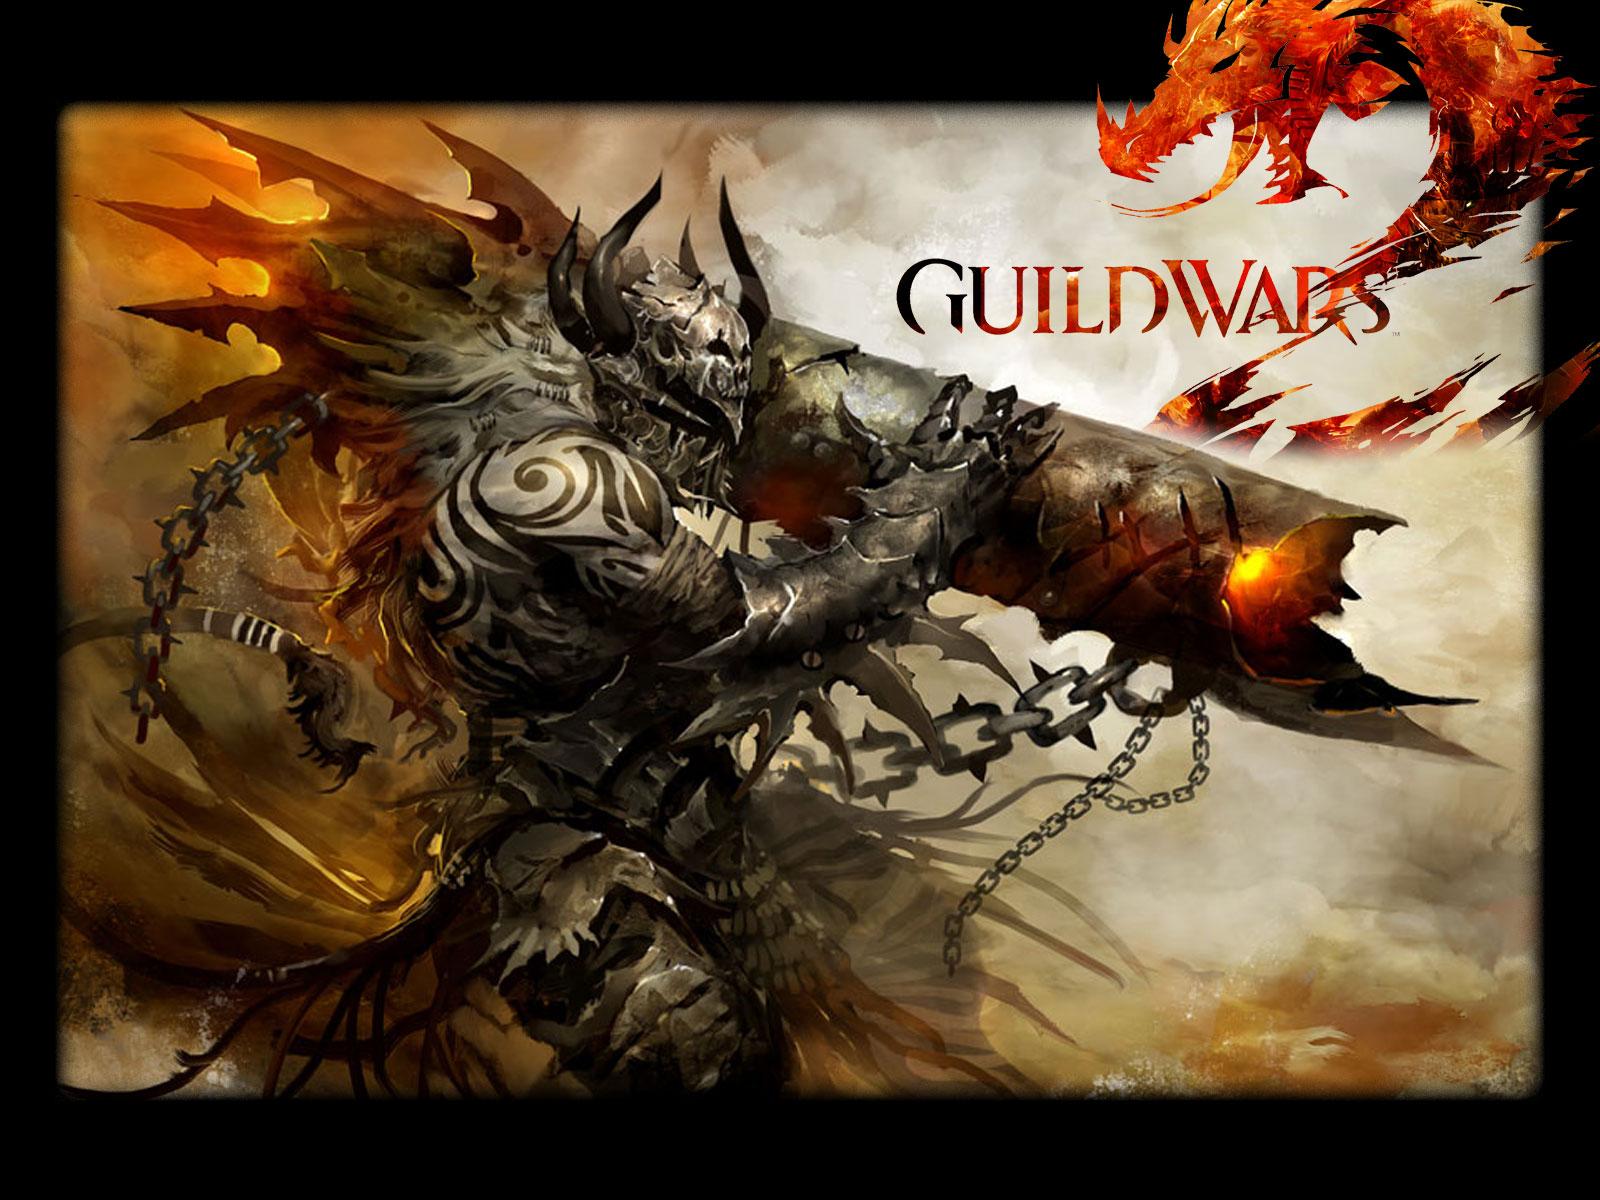 http://3.bp.blogspot.com/-bkZACZiIojM/T8MaGFM4UII/AAAAAAAAACg/sXRGrxLB6rE/s1600/guild-wars-2-wallpaper-18.jpg